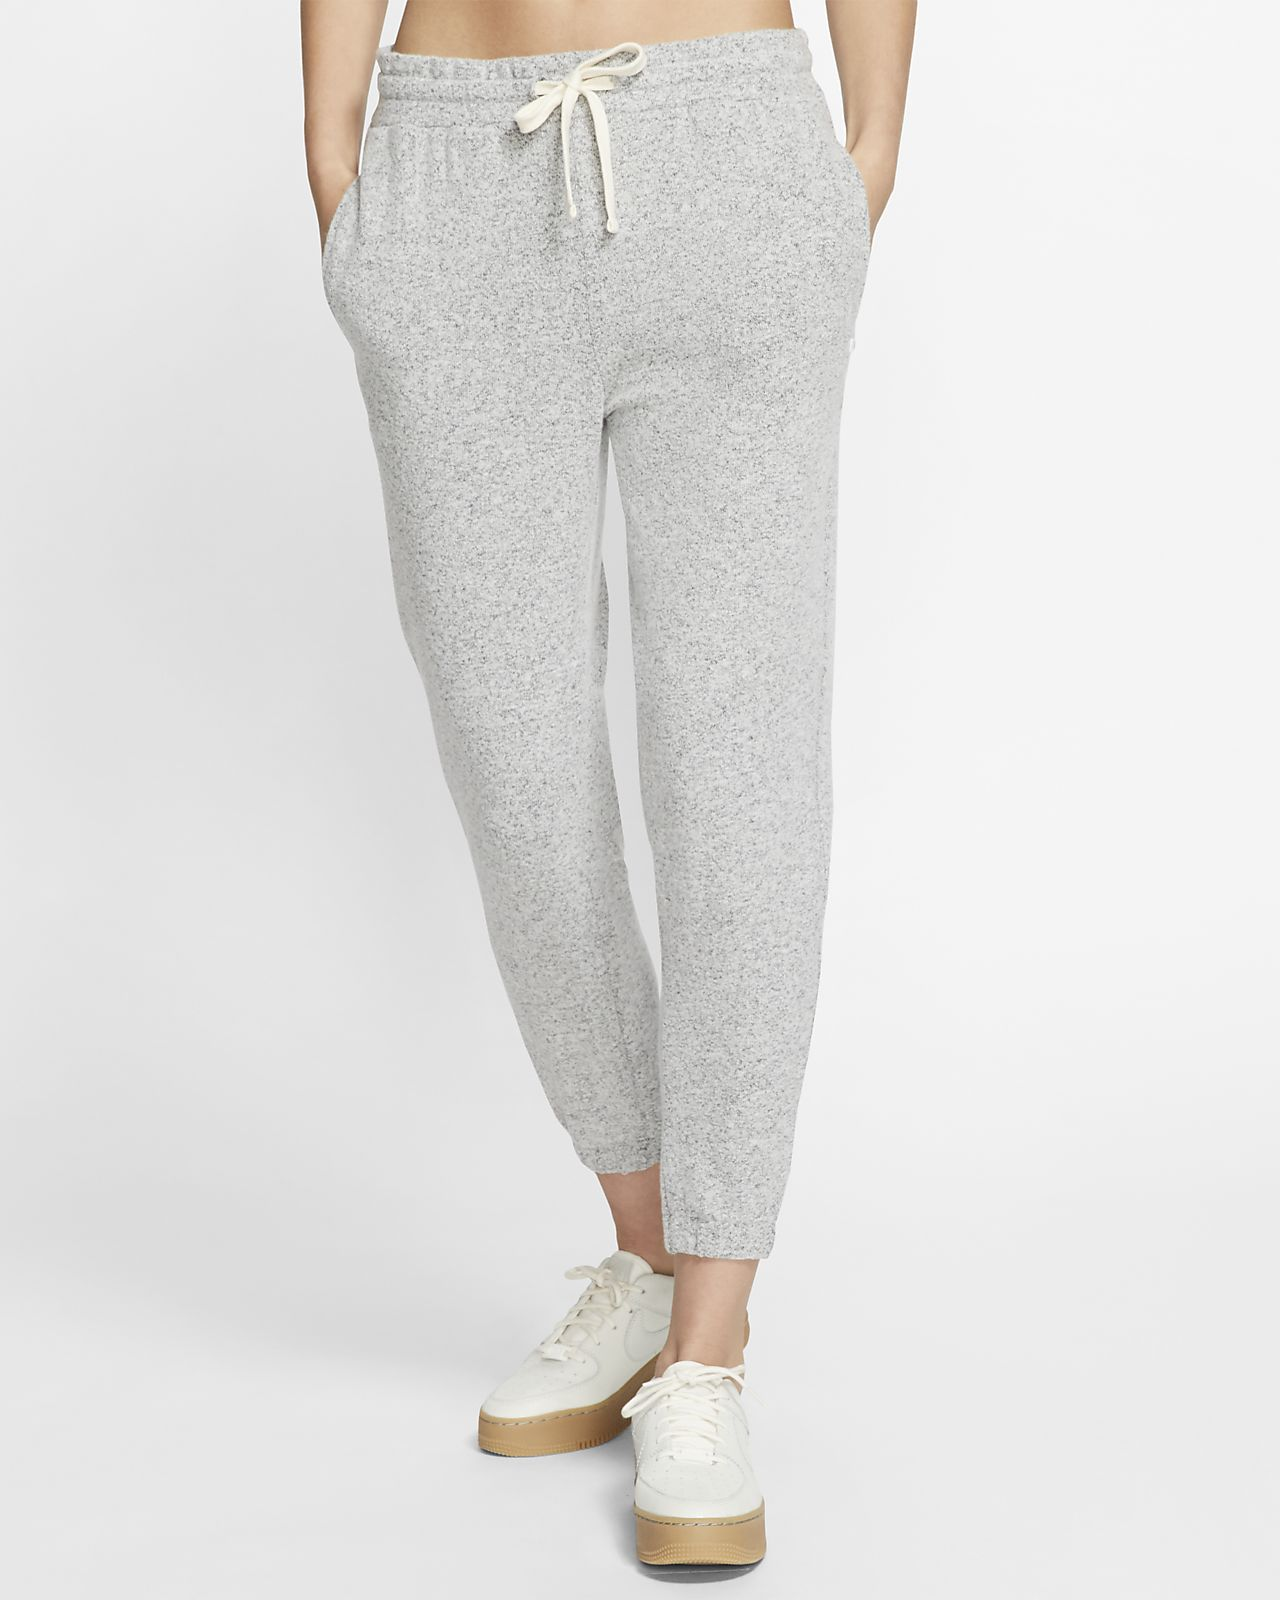 9f20281280ada Pantalon de jogging en tissu Fleece Hurley Chill pour Femme. Nike.com CA